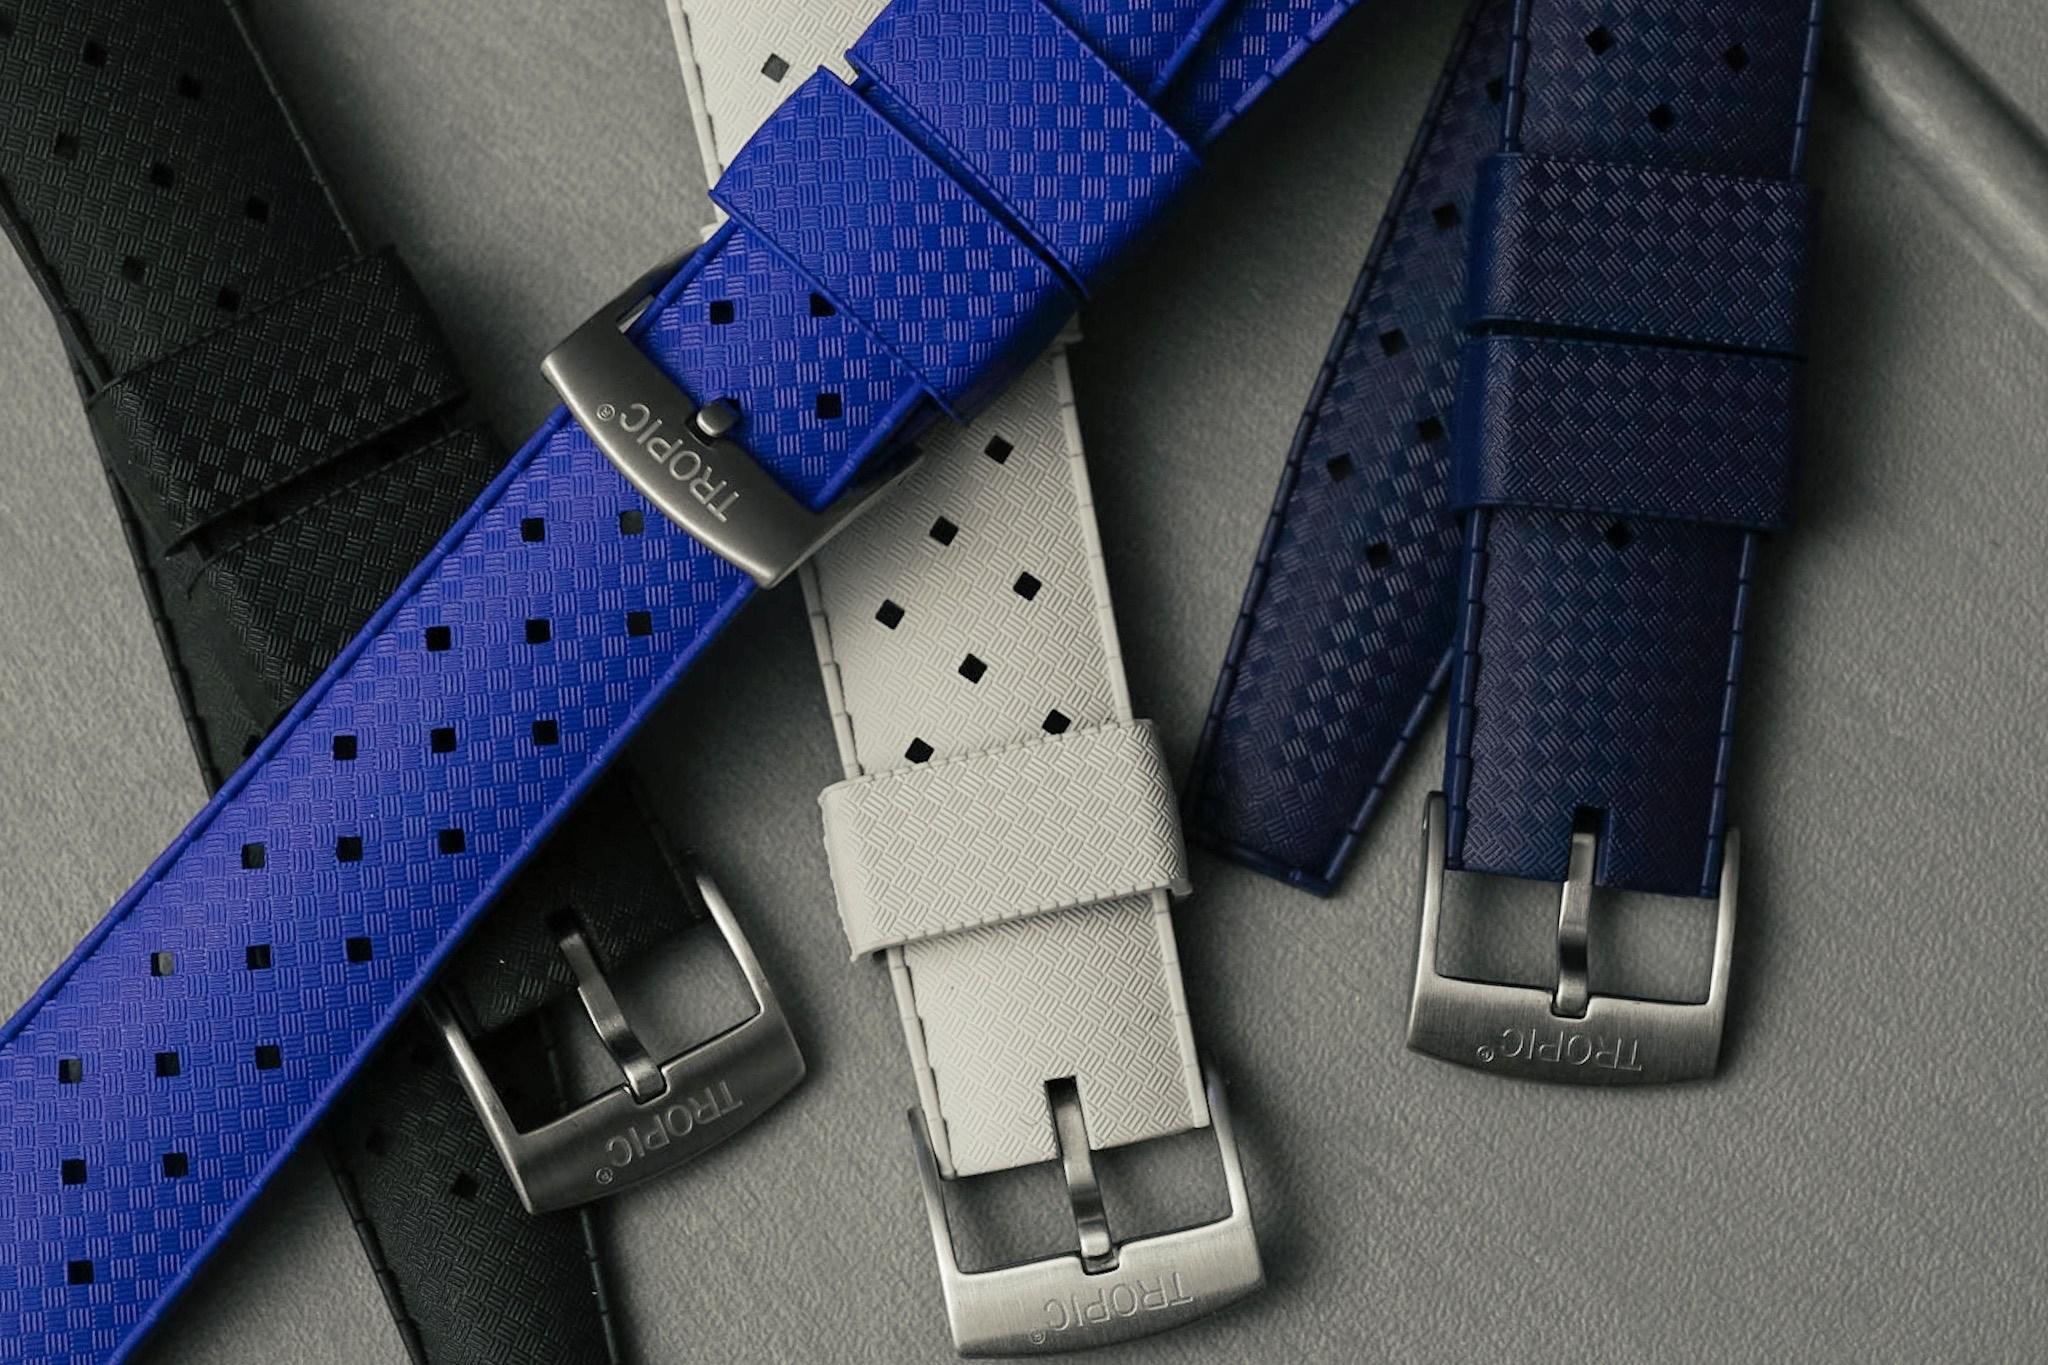 tropic straps